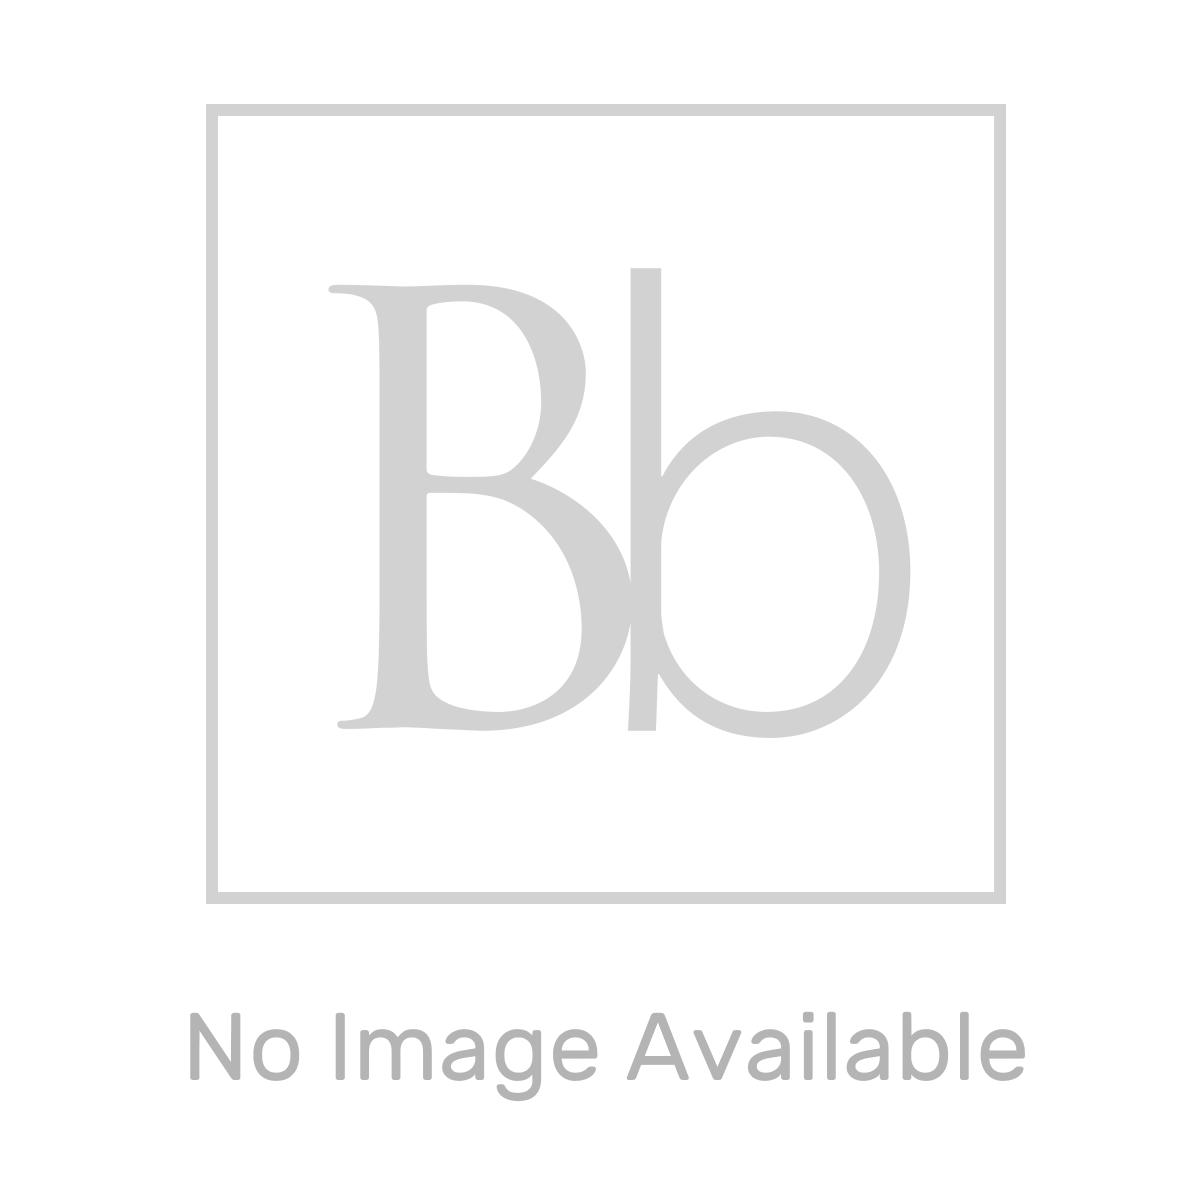 RAK Series 600 Close Coupled Toilet and 500 Series Walnut Mini Double Door Vanity Unit